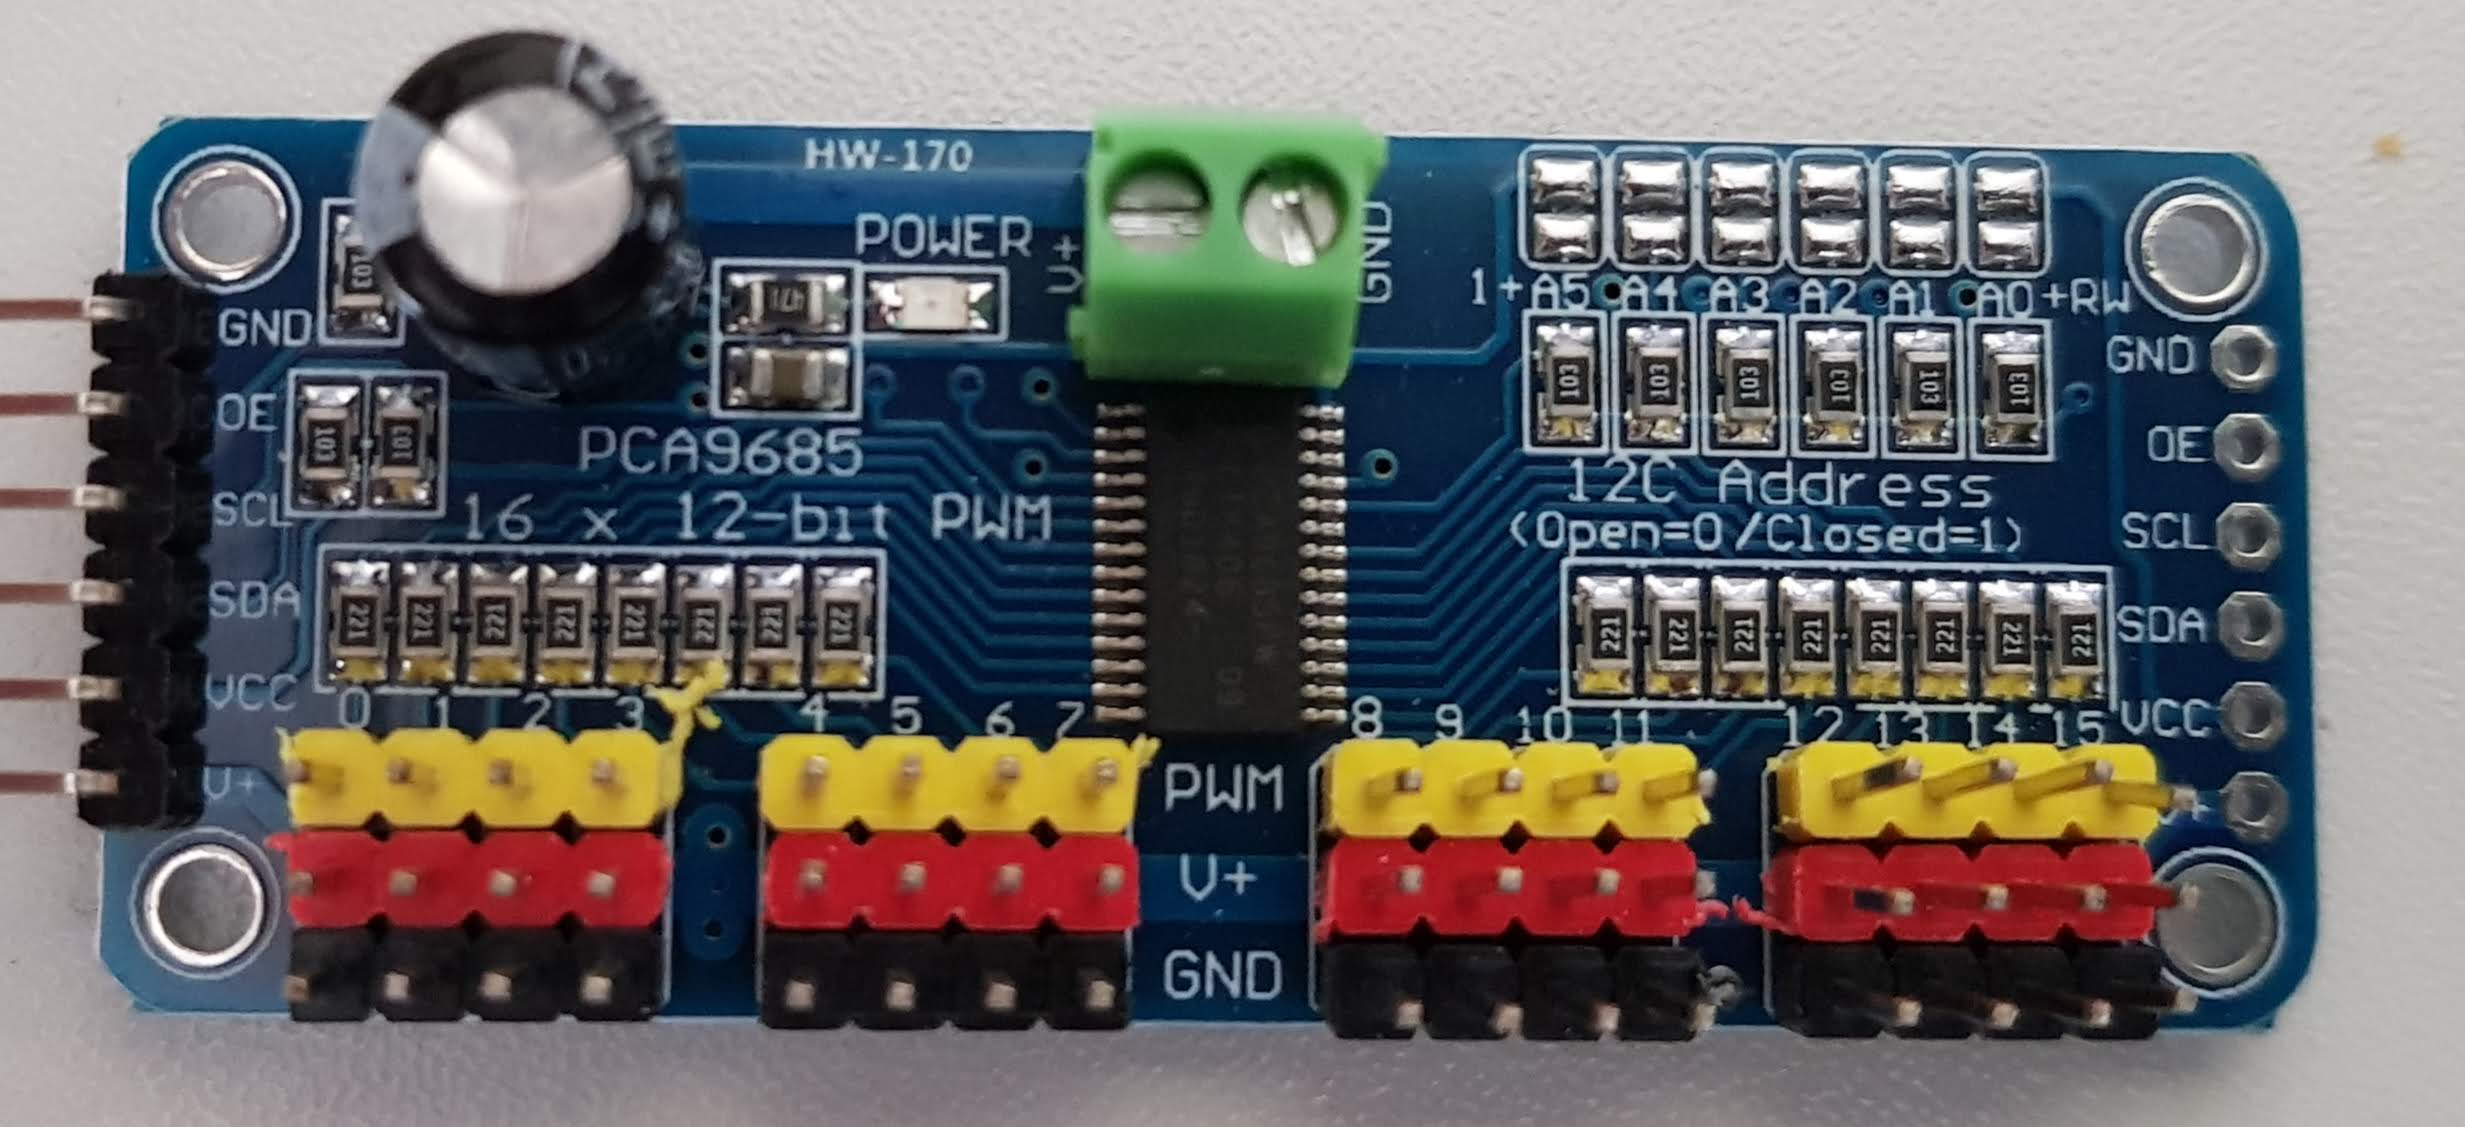 PCA 9685 Servo Driver Board oben